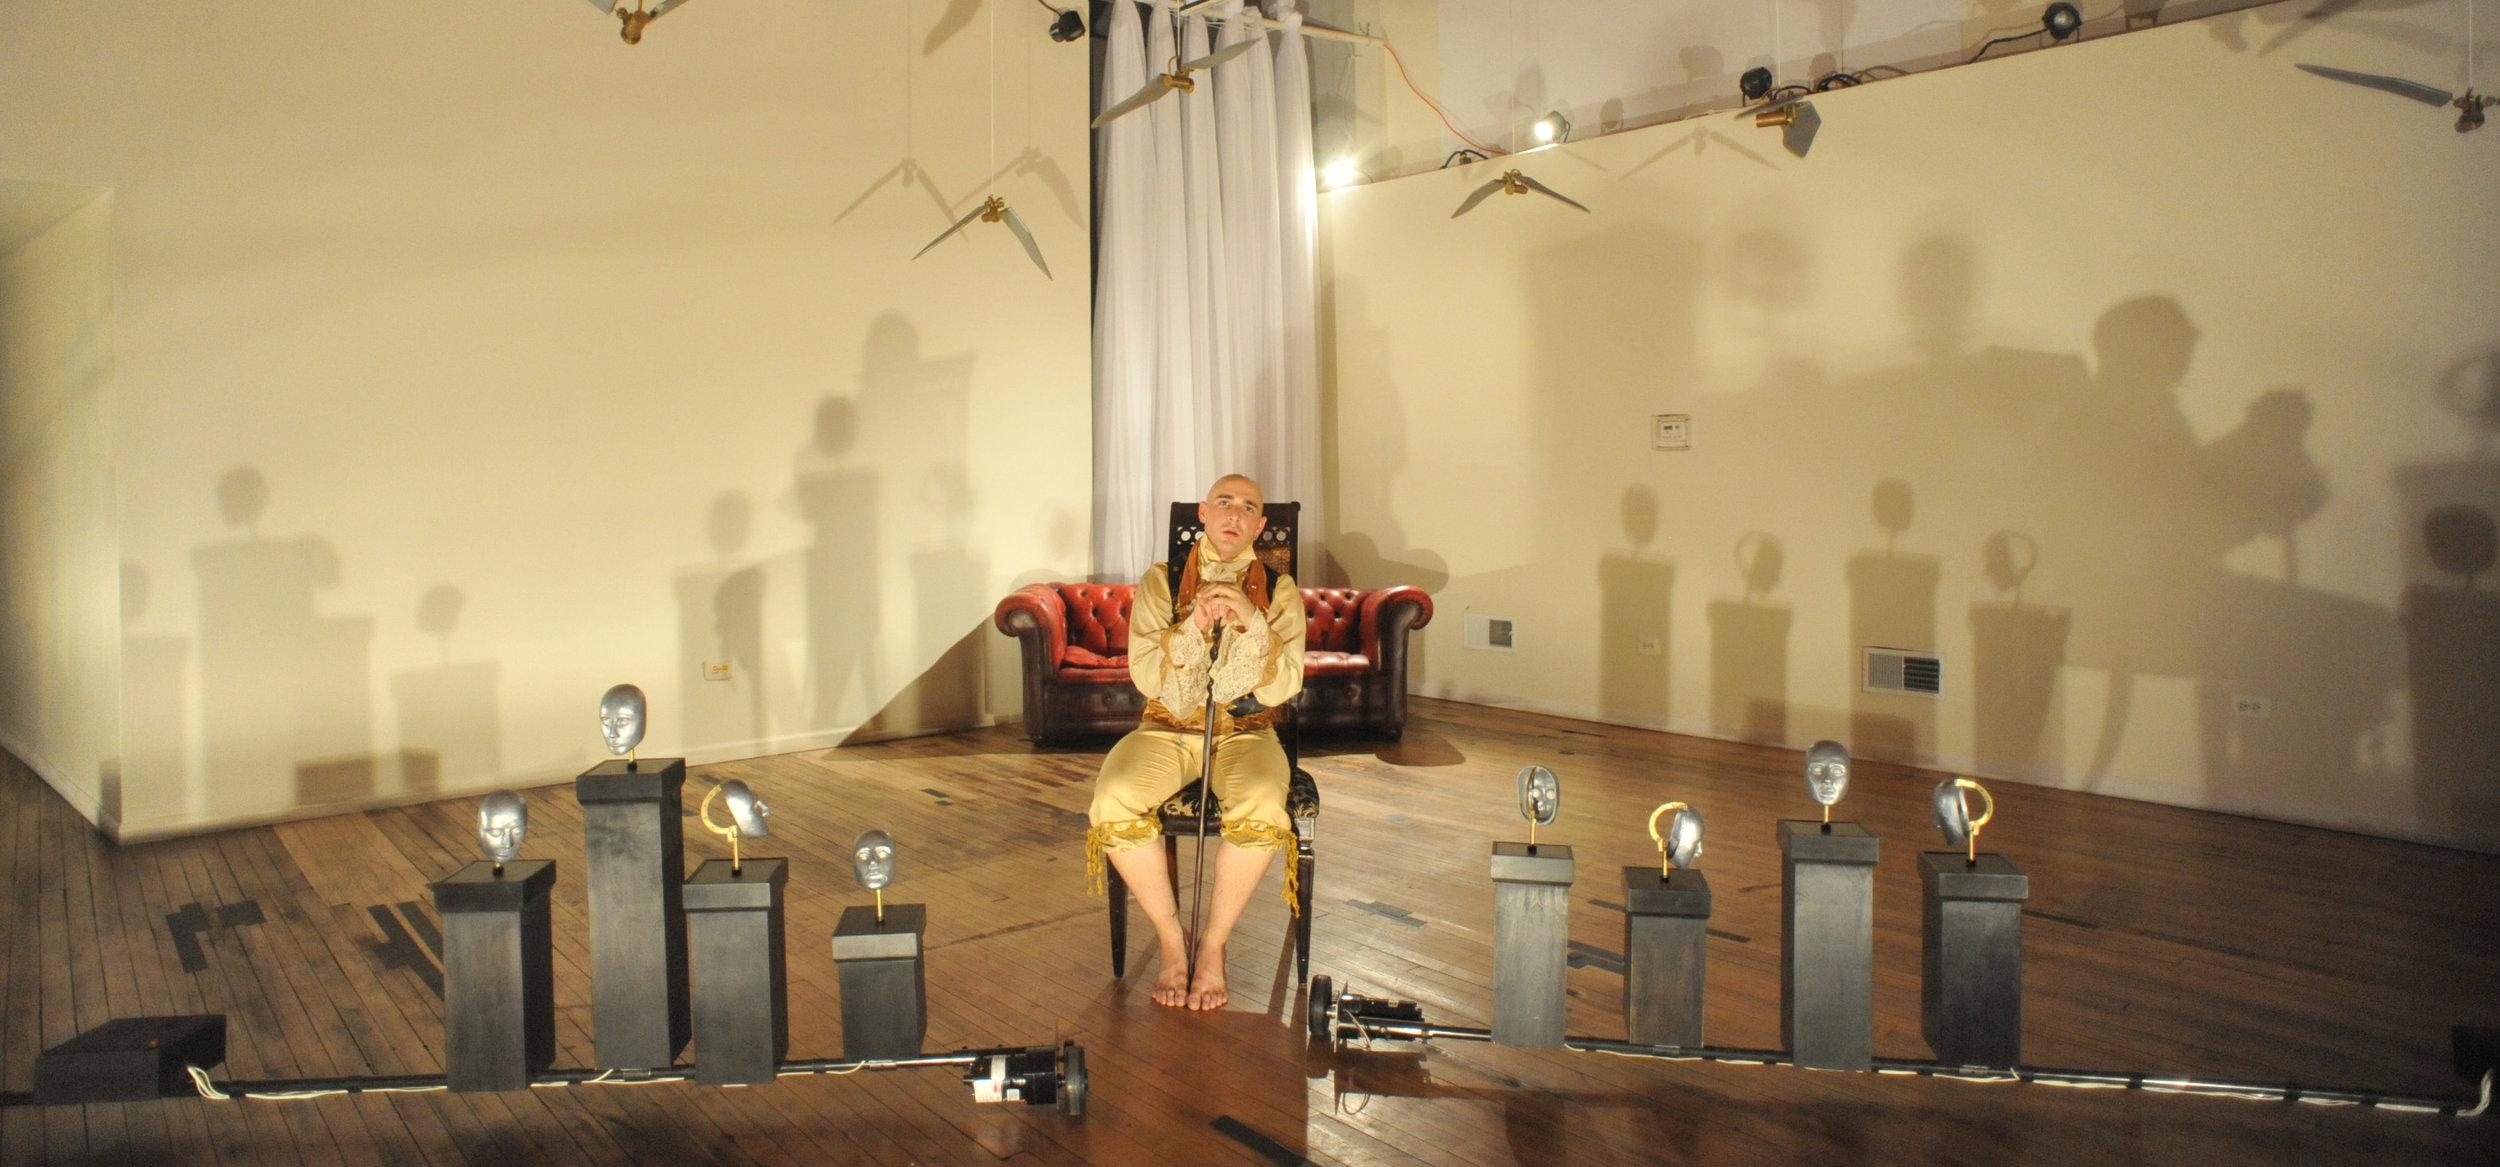 Julie's lighting of Khecari Dance, The Waking Room 2009; Choreography: Jonathan Meyer; Dancer: Philip Elson Photography: Dan Merlo